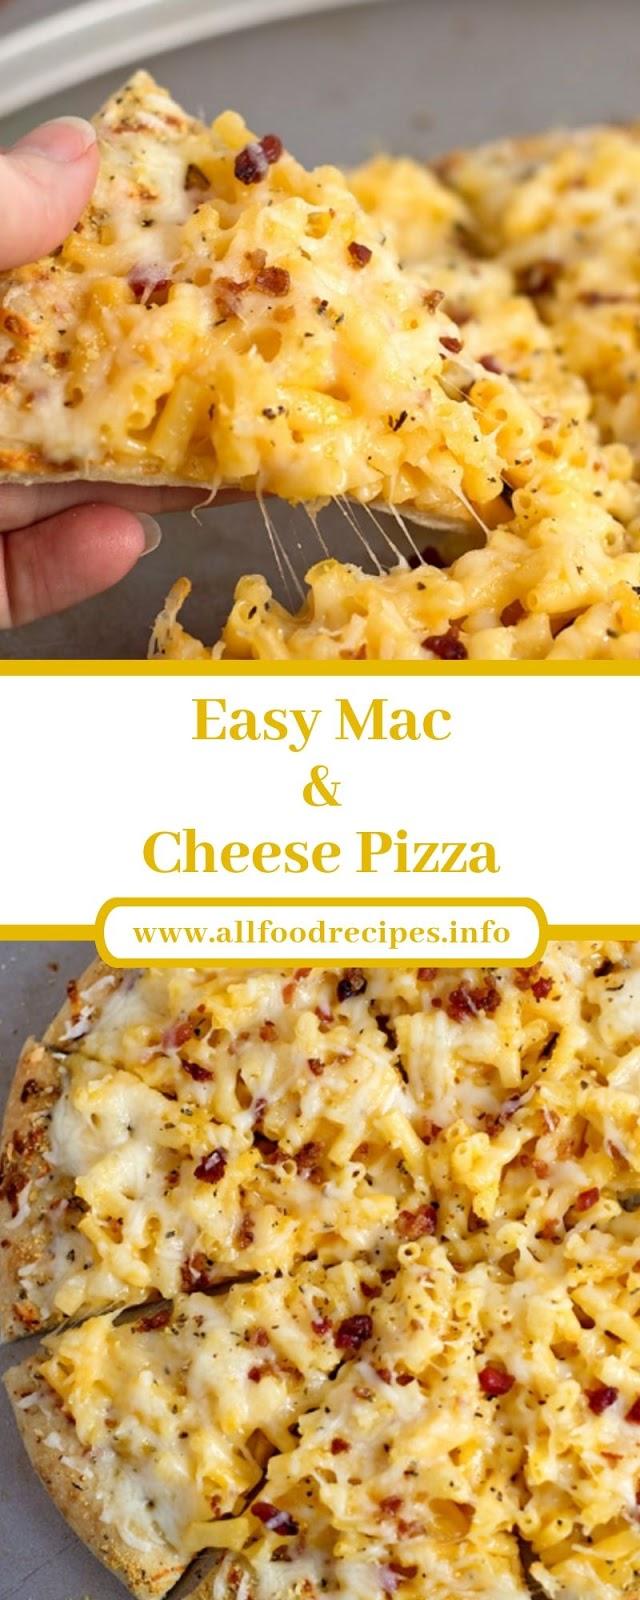 Easy Mac & Cheese Pizza